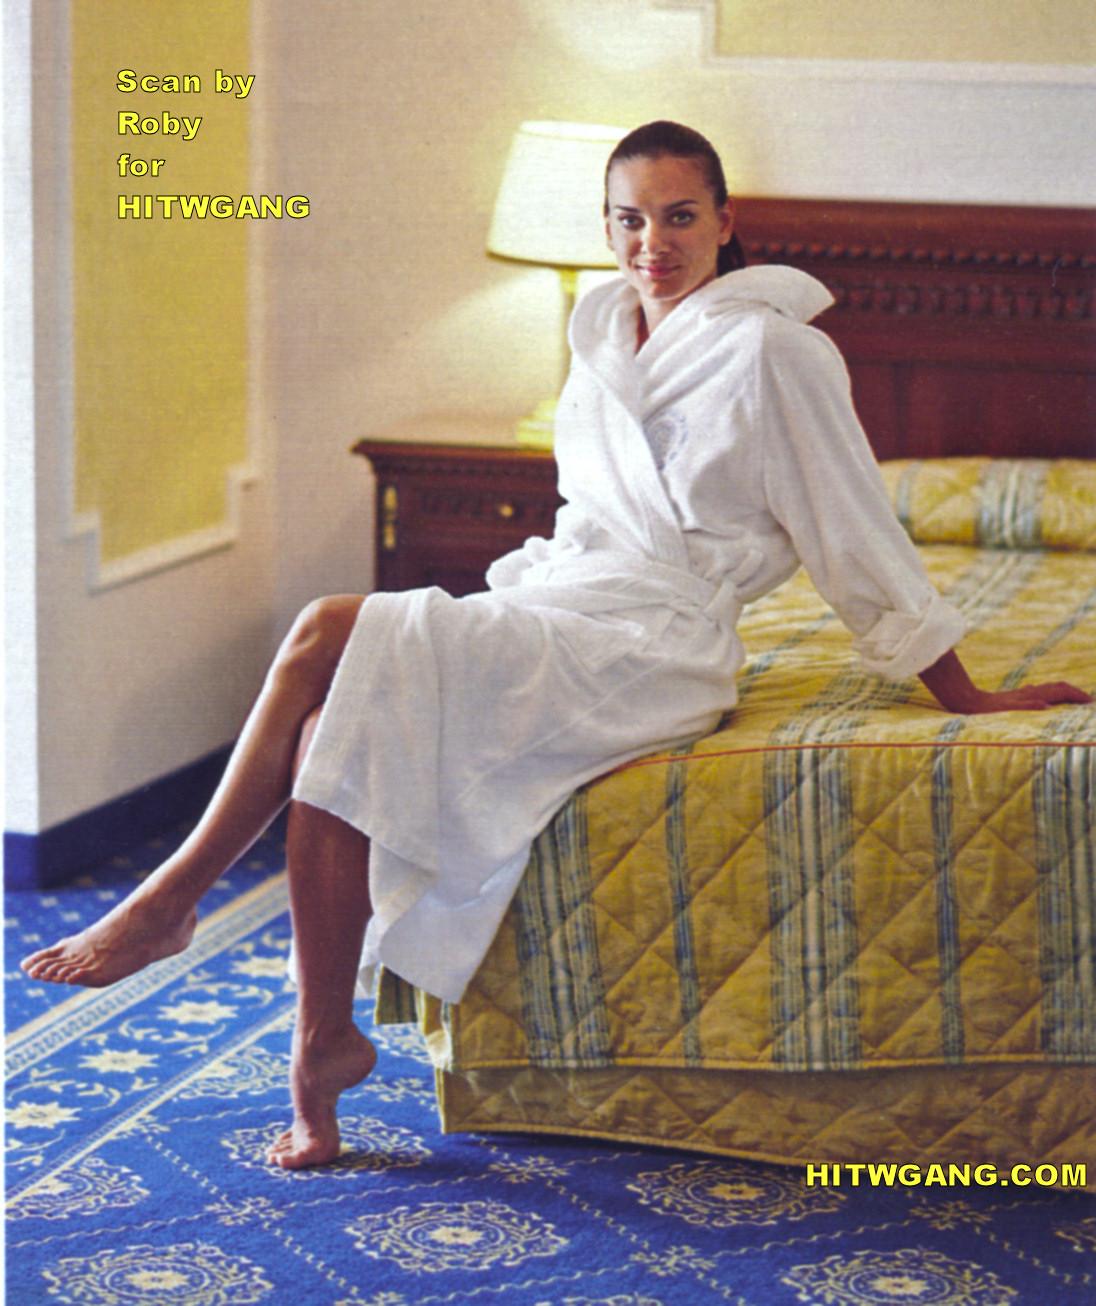 http://4.bp.blogspot.com/-c3KJorsxZuI/UCN7IJ2SepI/AAAAAAAAMAU/8vJ7p1LWeMc/s1600/Yelena+Gadzhievna+Isinbayeva+(10).jpg